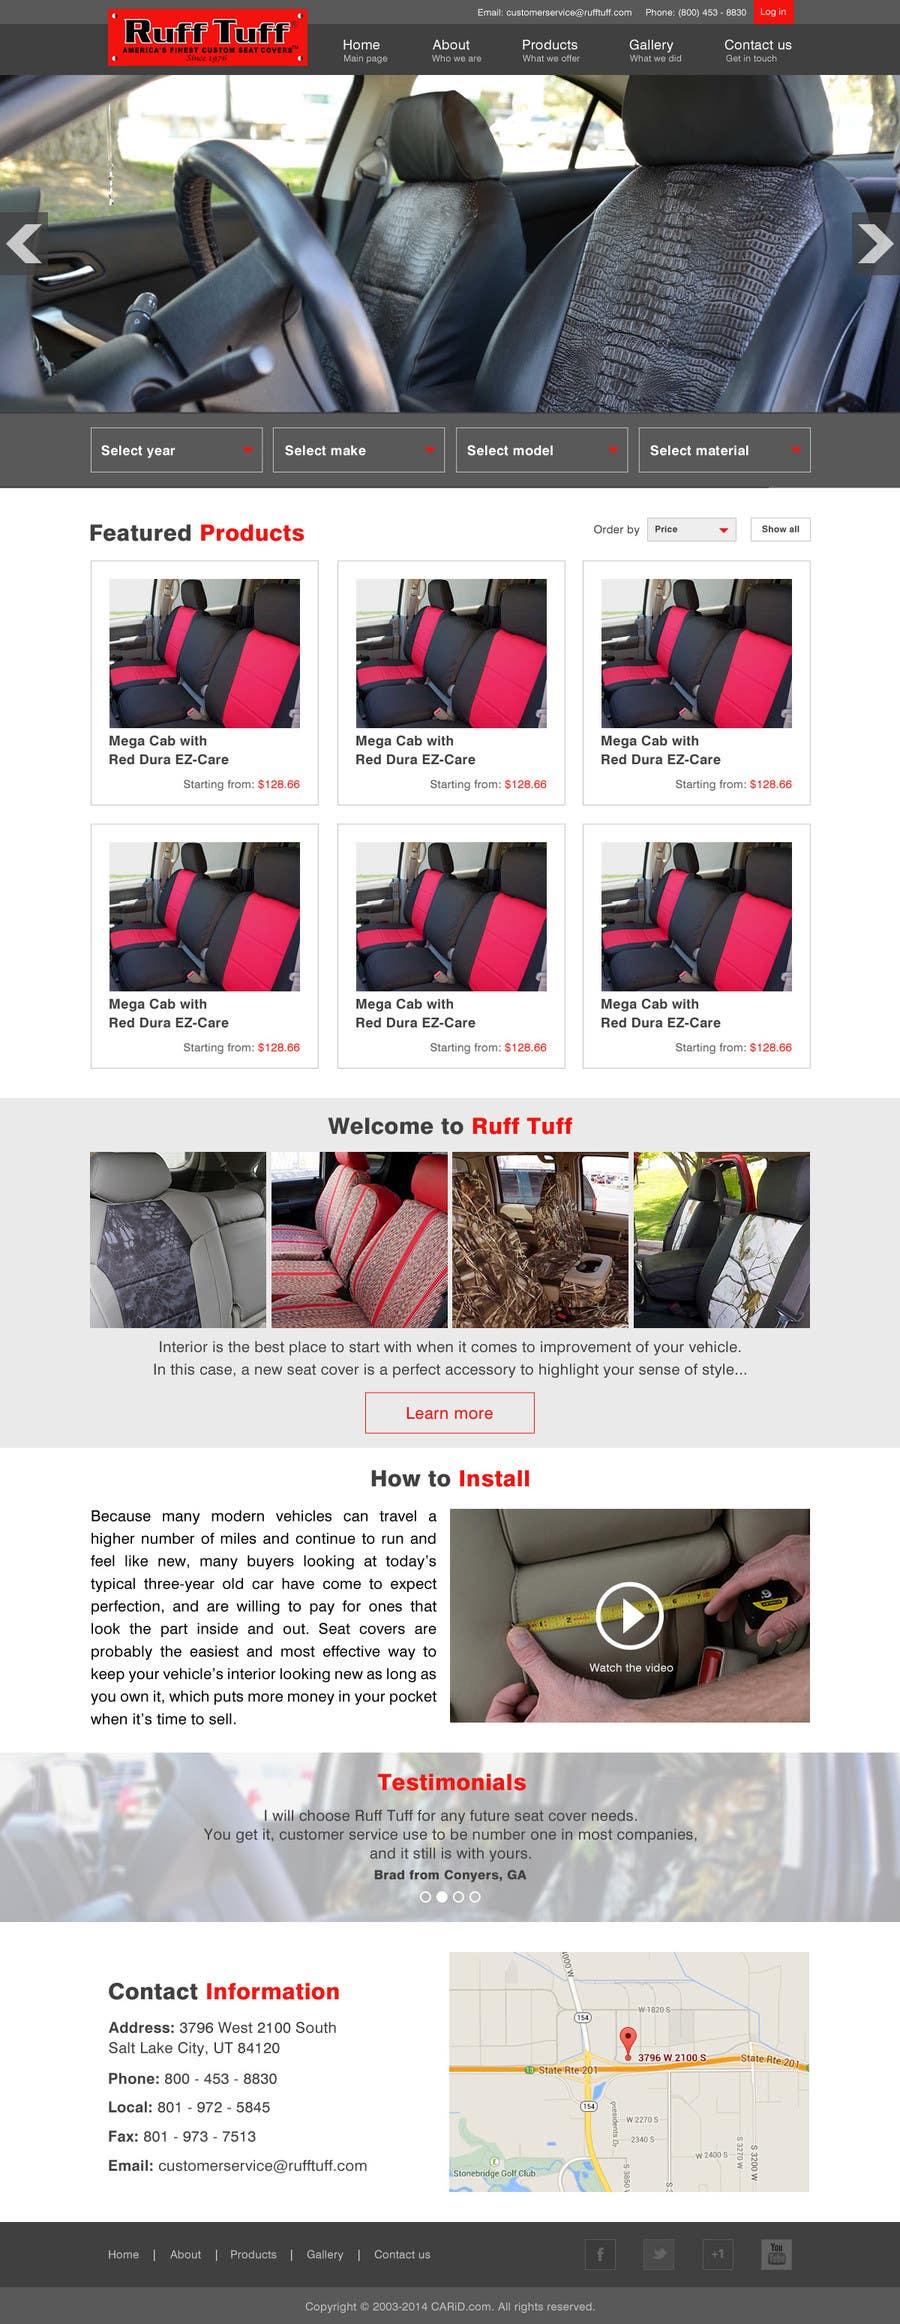 Penyertaan Peraduan #                                        6                                      untuk                                         Design a Website Mockup for an auto seat cover manufacturer